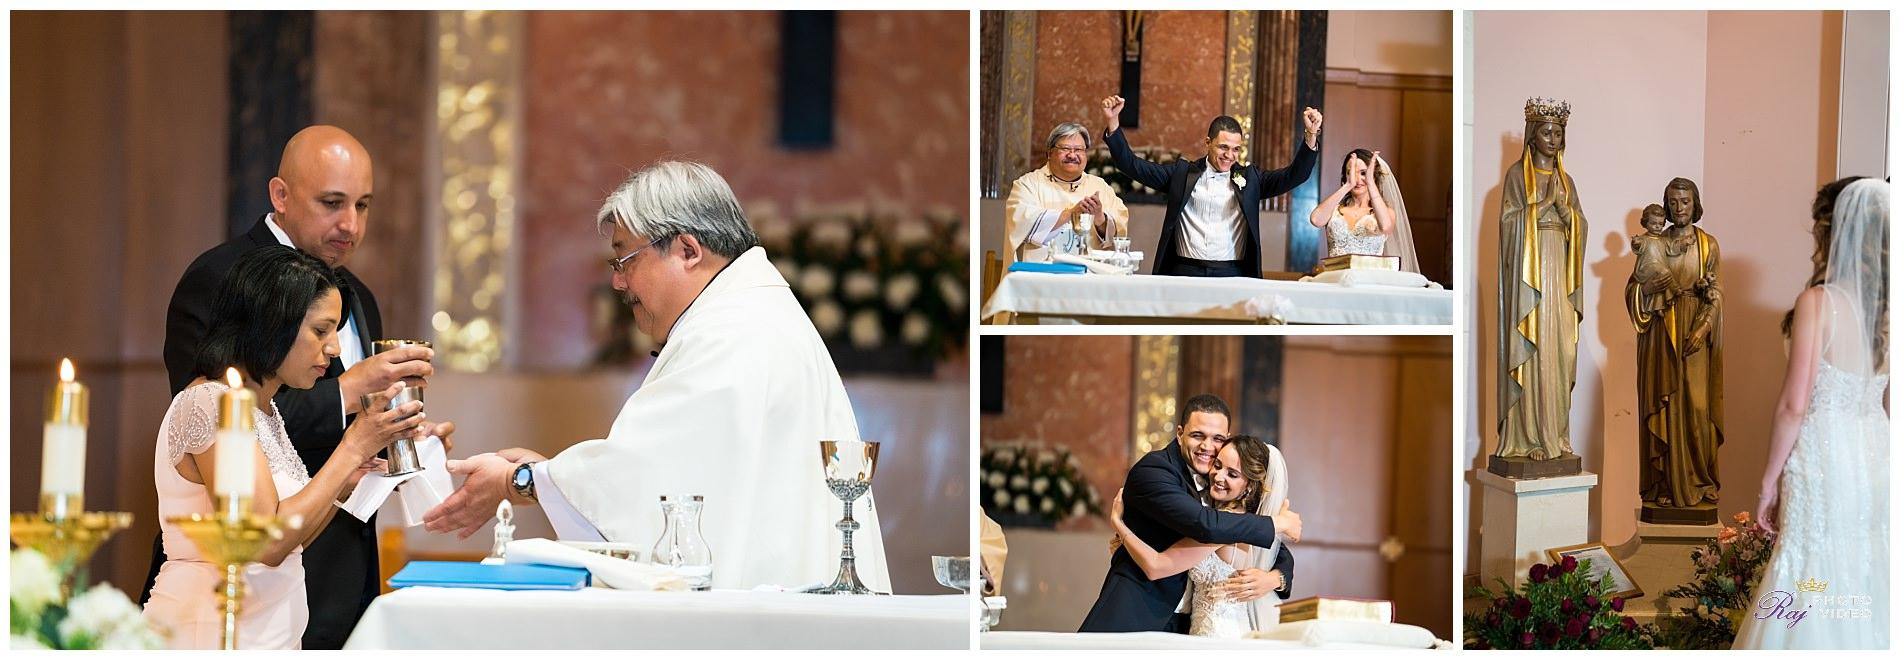 St-Valentines-Catholic-Church-Bloomfield-NJ-Wedding-Yanet-Jose-15.jpg